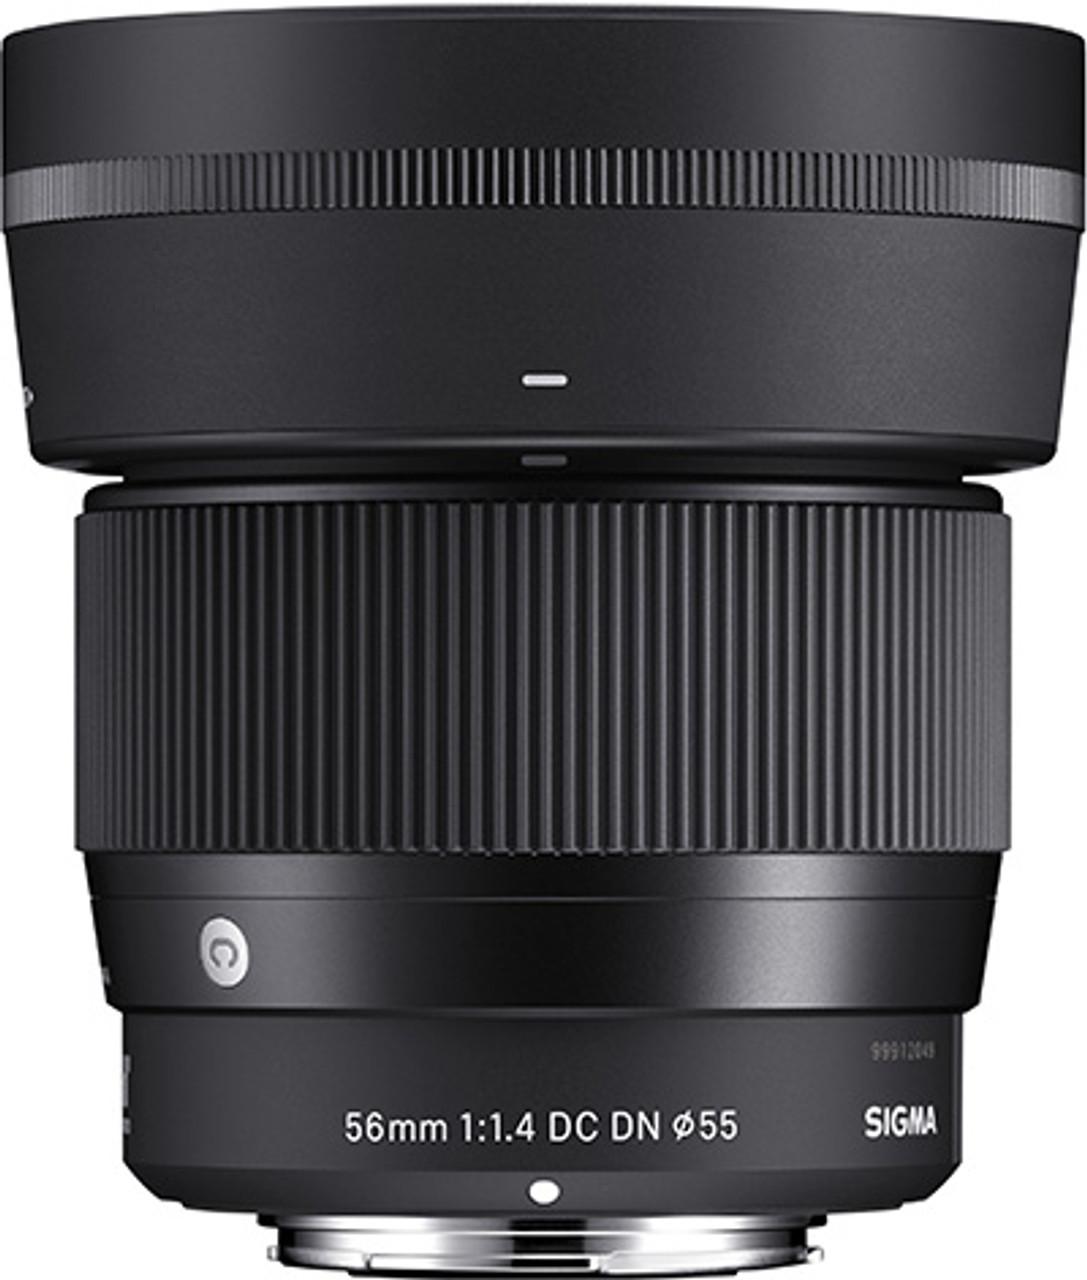 Sigma 56mm F1.4 DC DN Contemporary - Micro Four Thirds